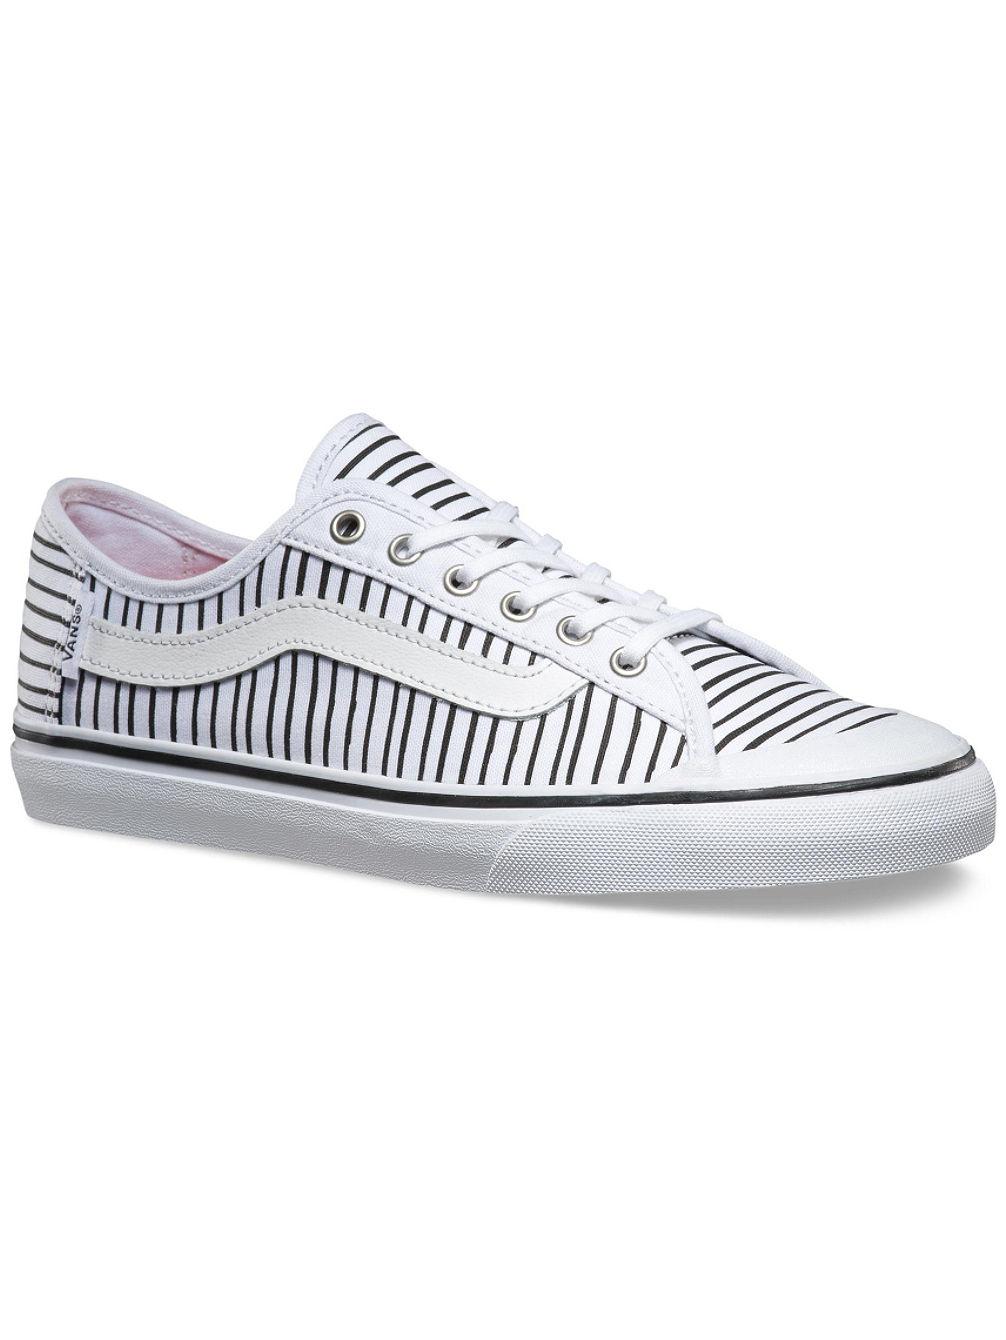 Buy Vans Black Ball Sf Sneakers Women online at blue-tomato.com b9b6bad52